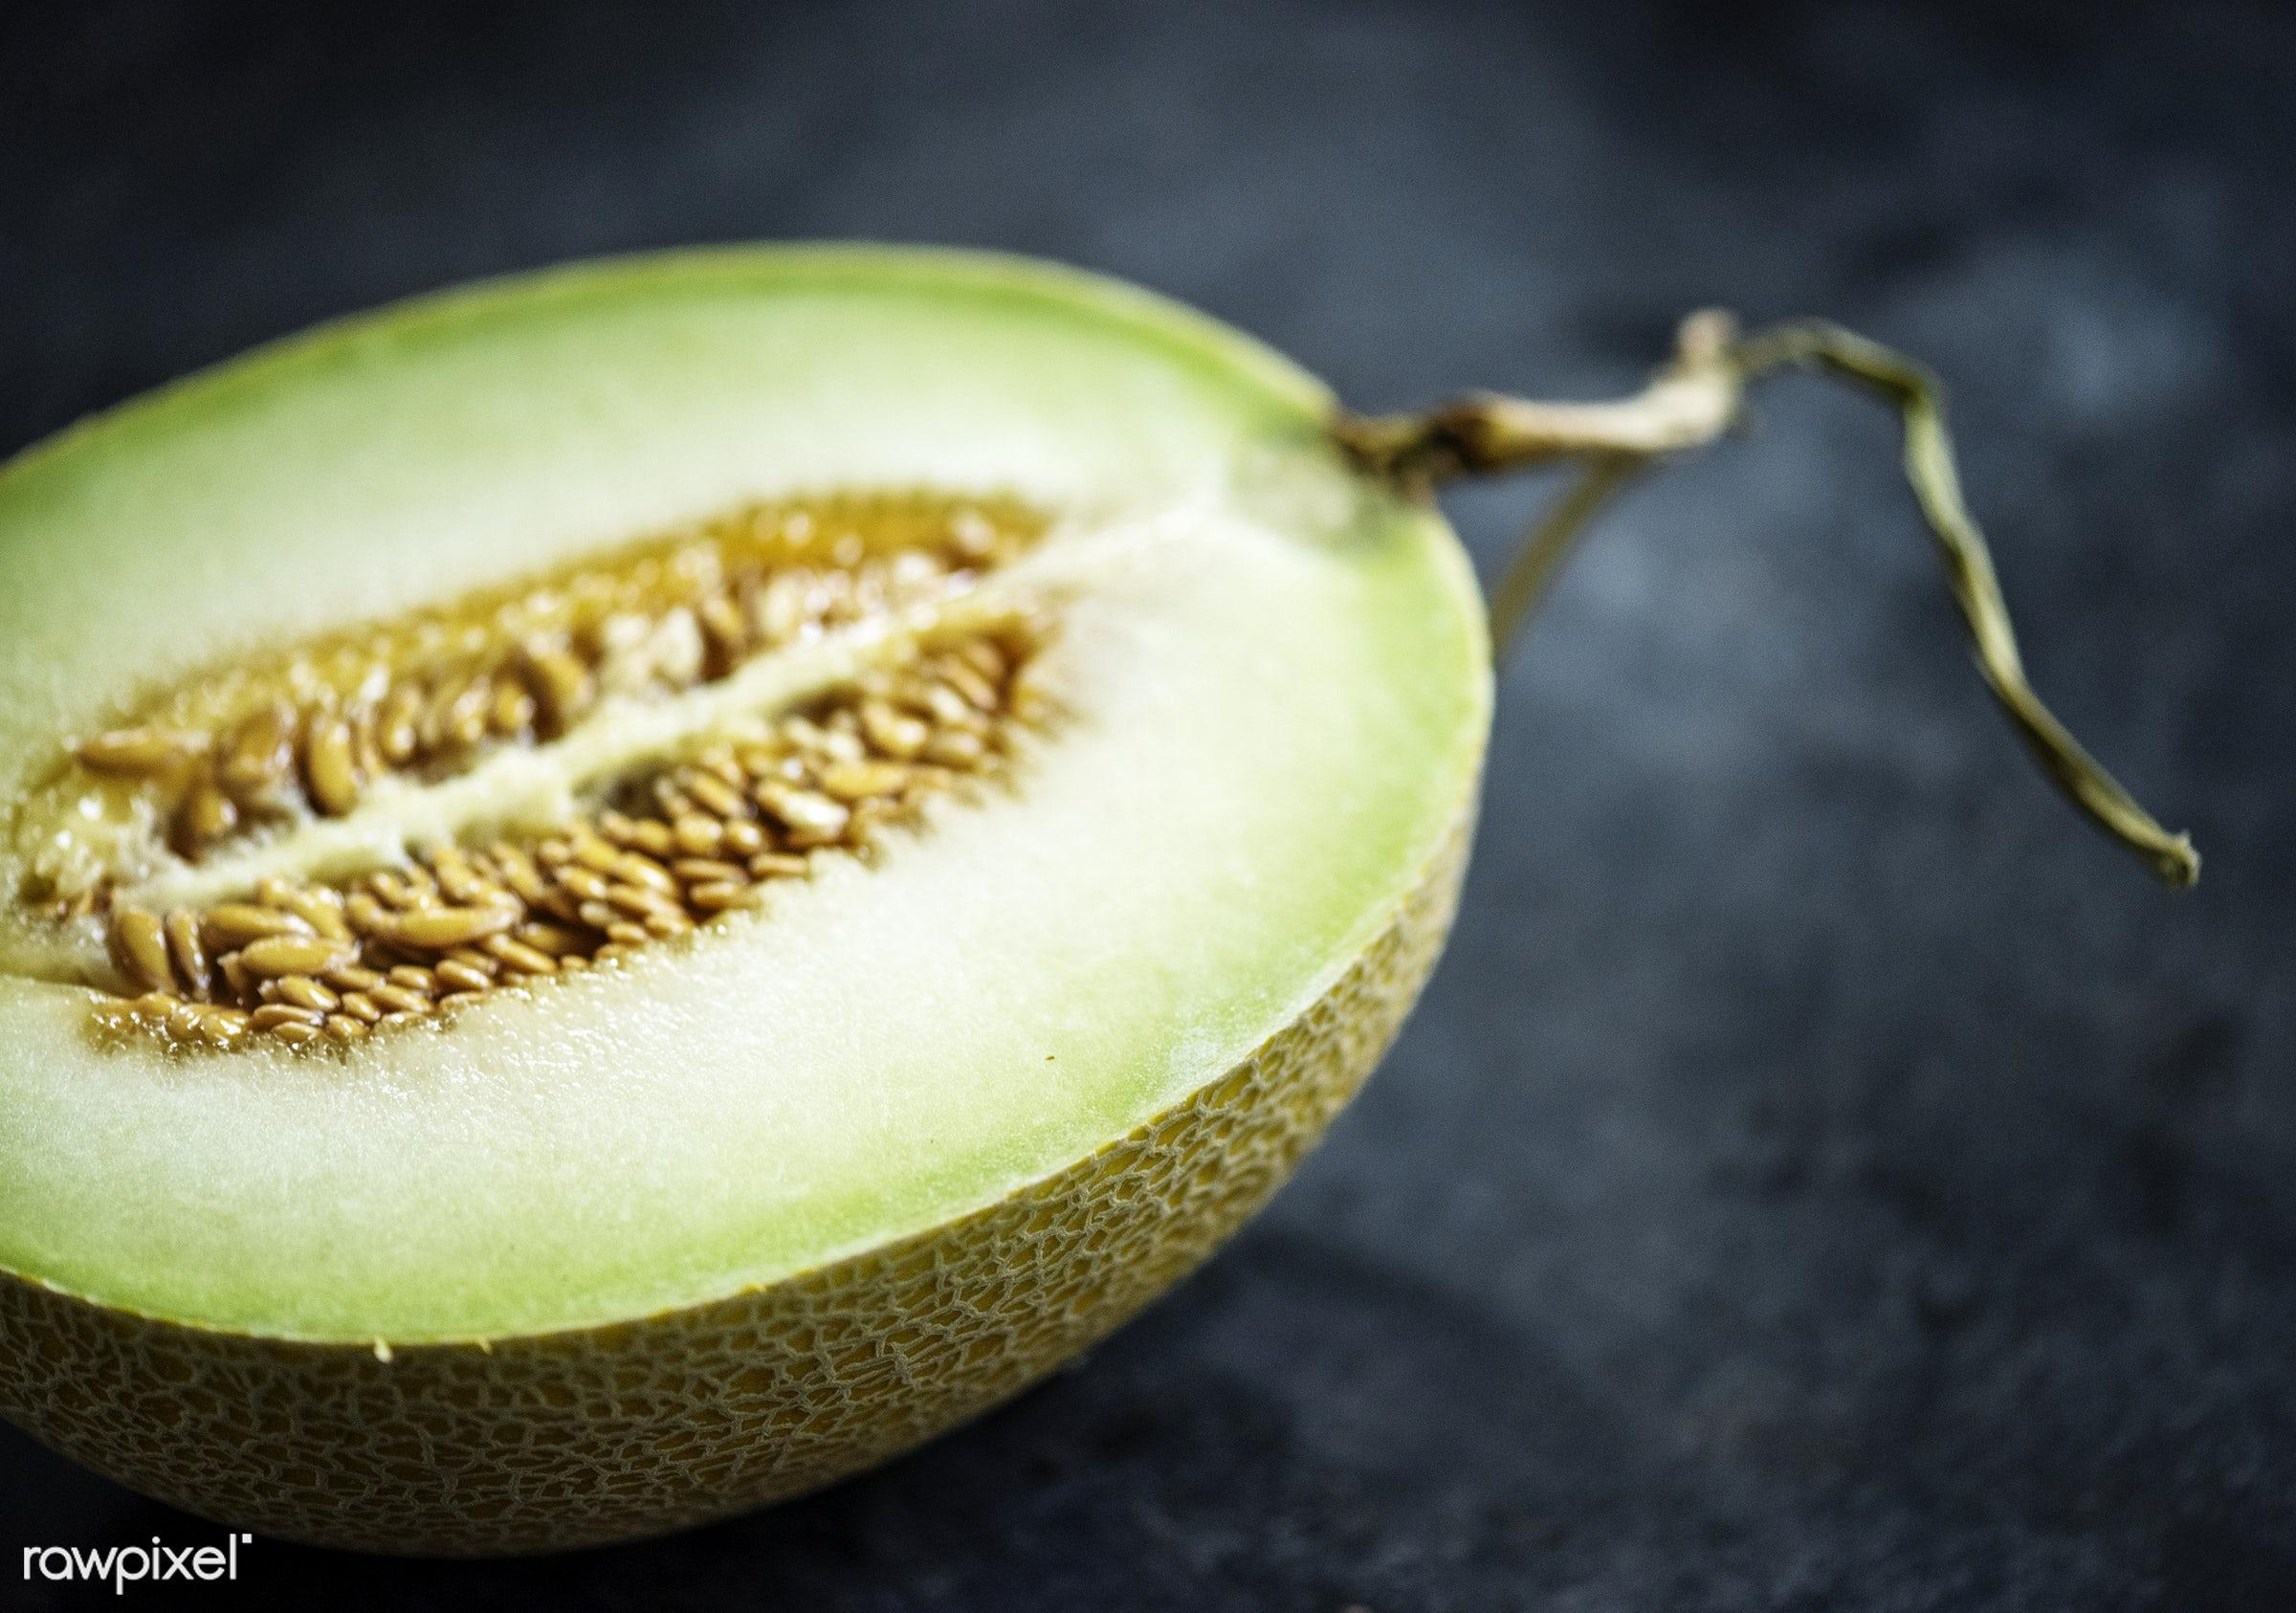 raw, nobody, juicy, fruit, green, half, black background, real, melon, nature, cantaloupe, fresh, food, ripe, seeds, cut,...